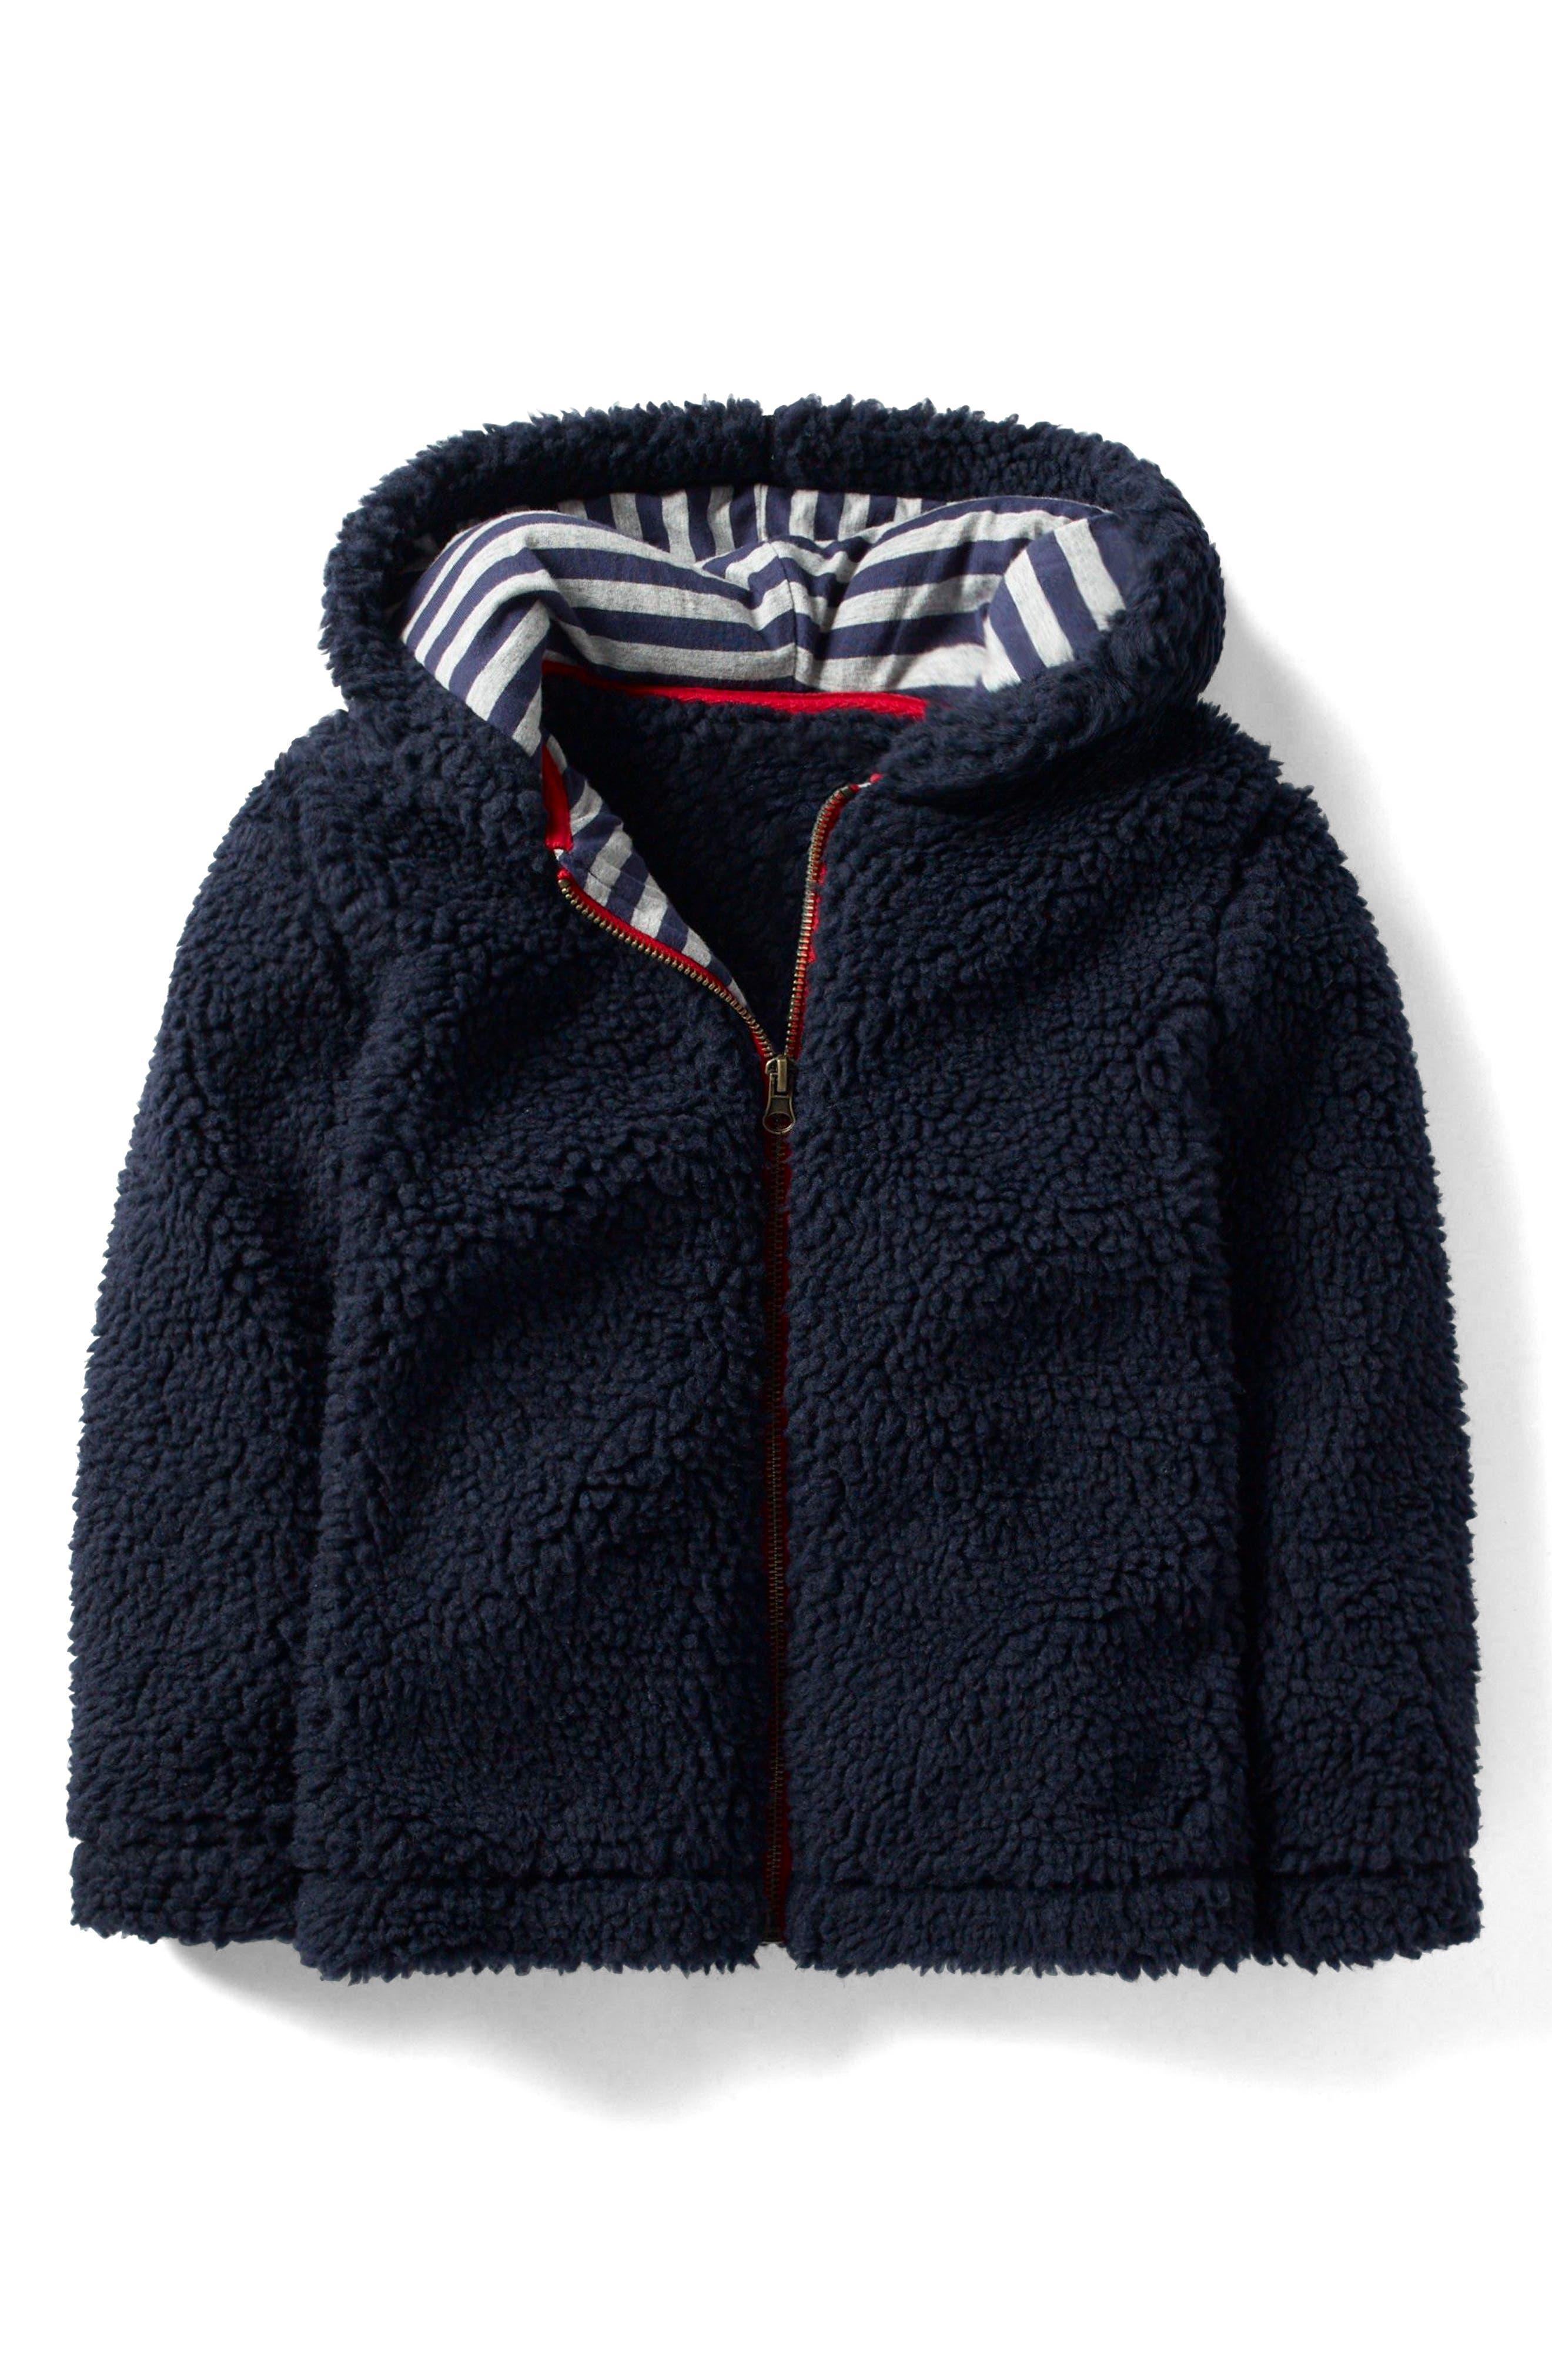 Mini Boden Hooded Fleece Jacket (Toddler Boys, Little Boys & Big Boys)